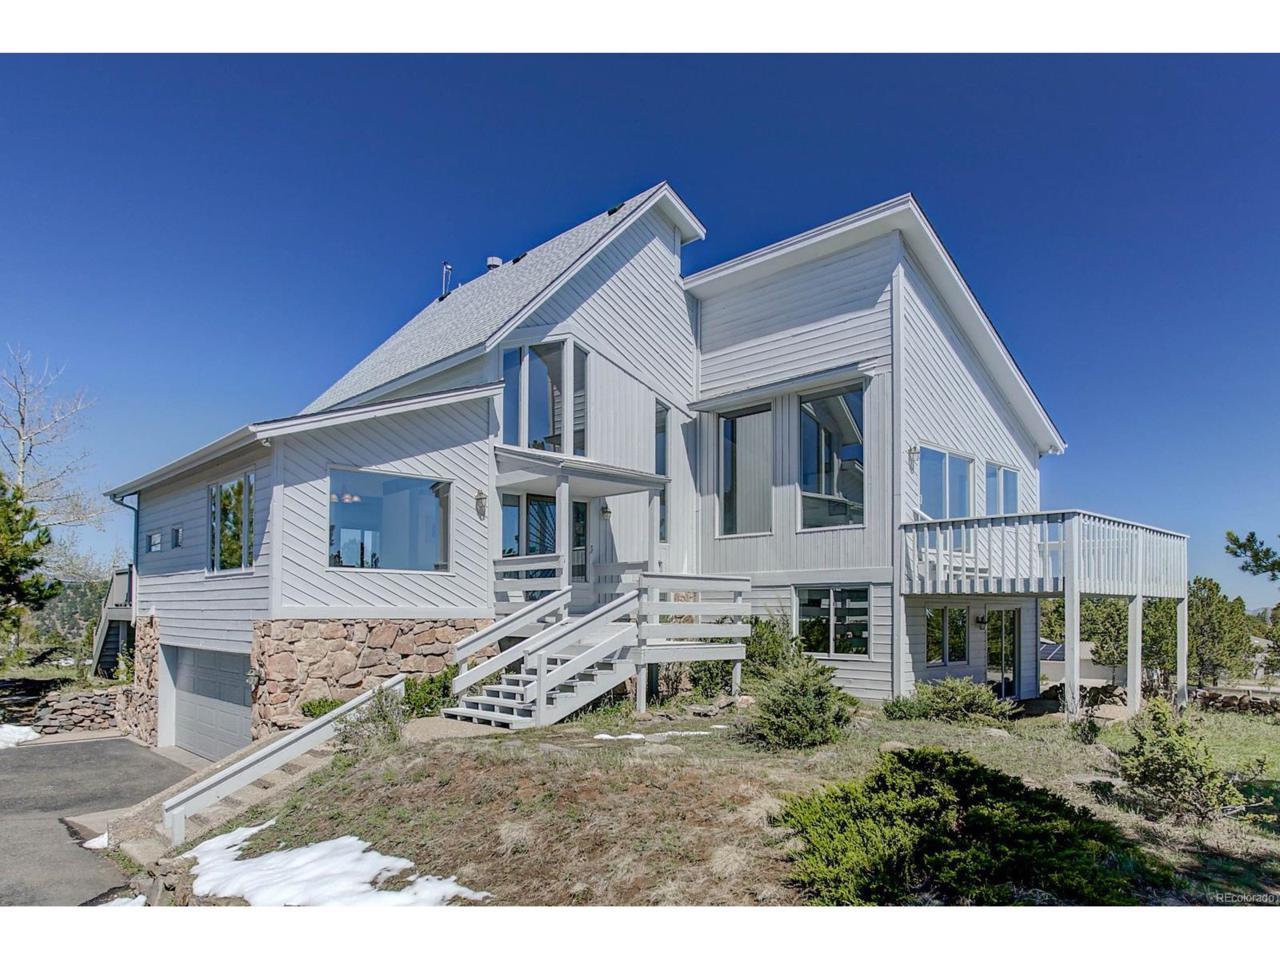 1523 Montane Drive, Golden, CO 80401 (MLS #4391337) :: 8z Real Estate